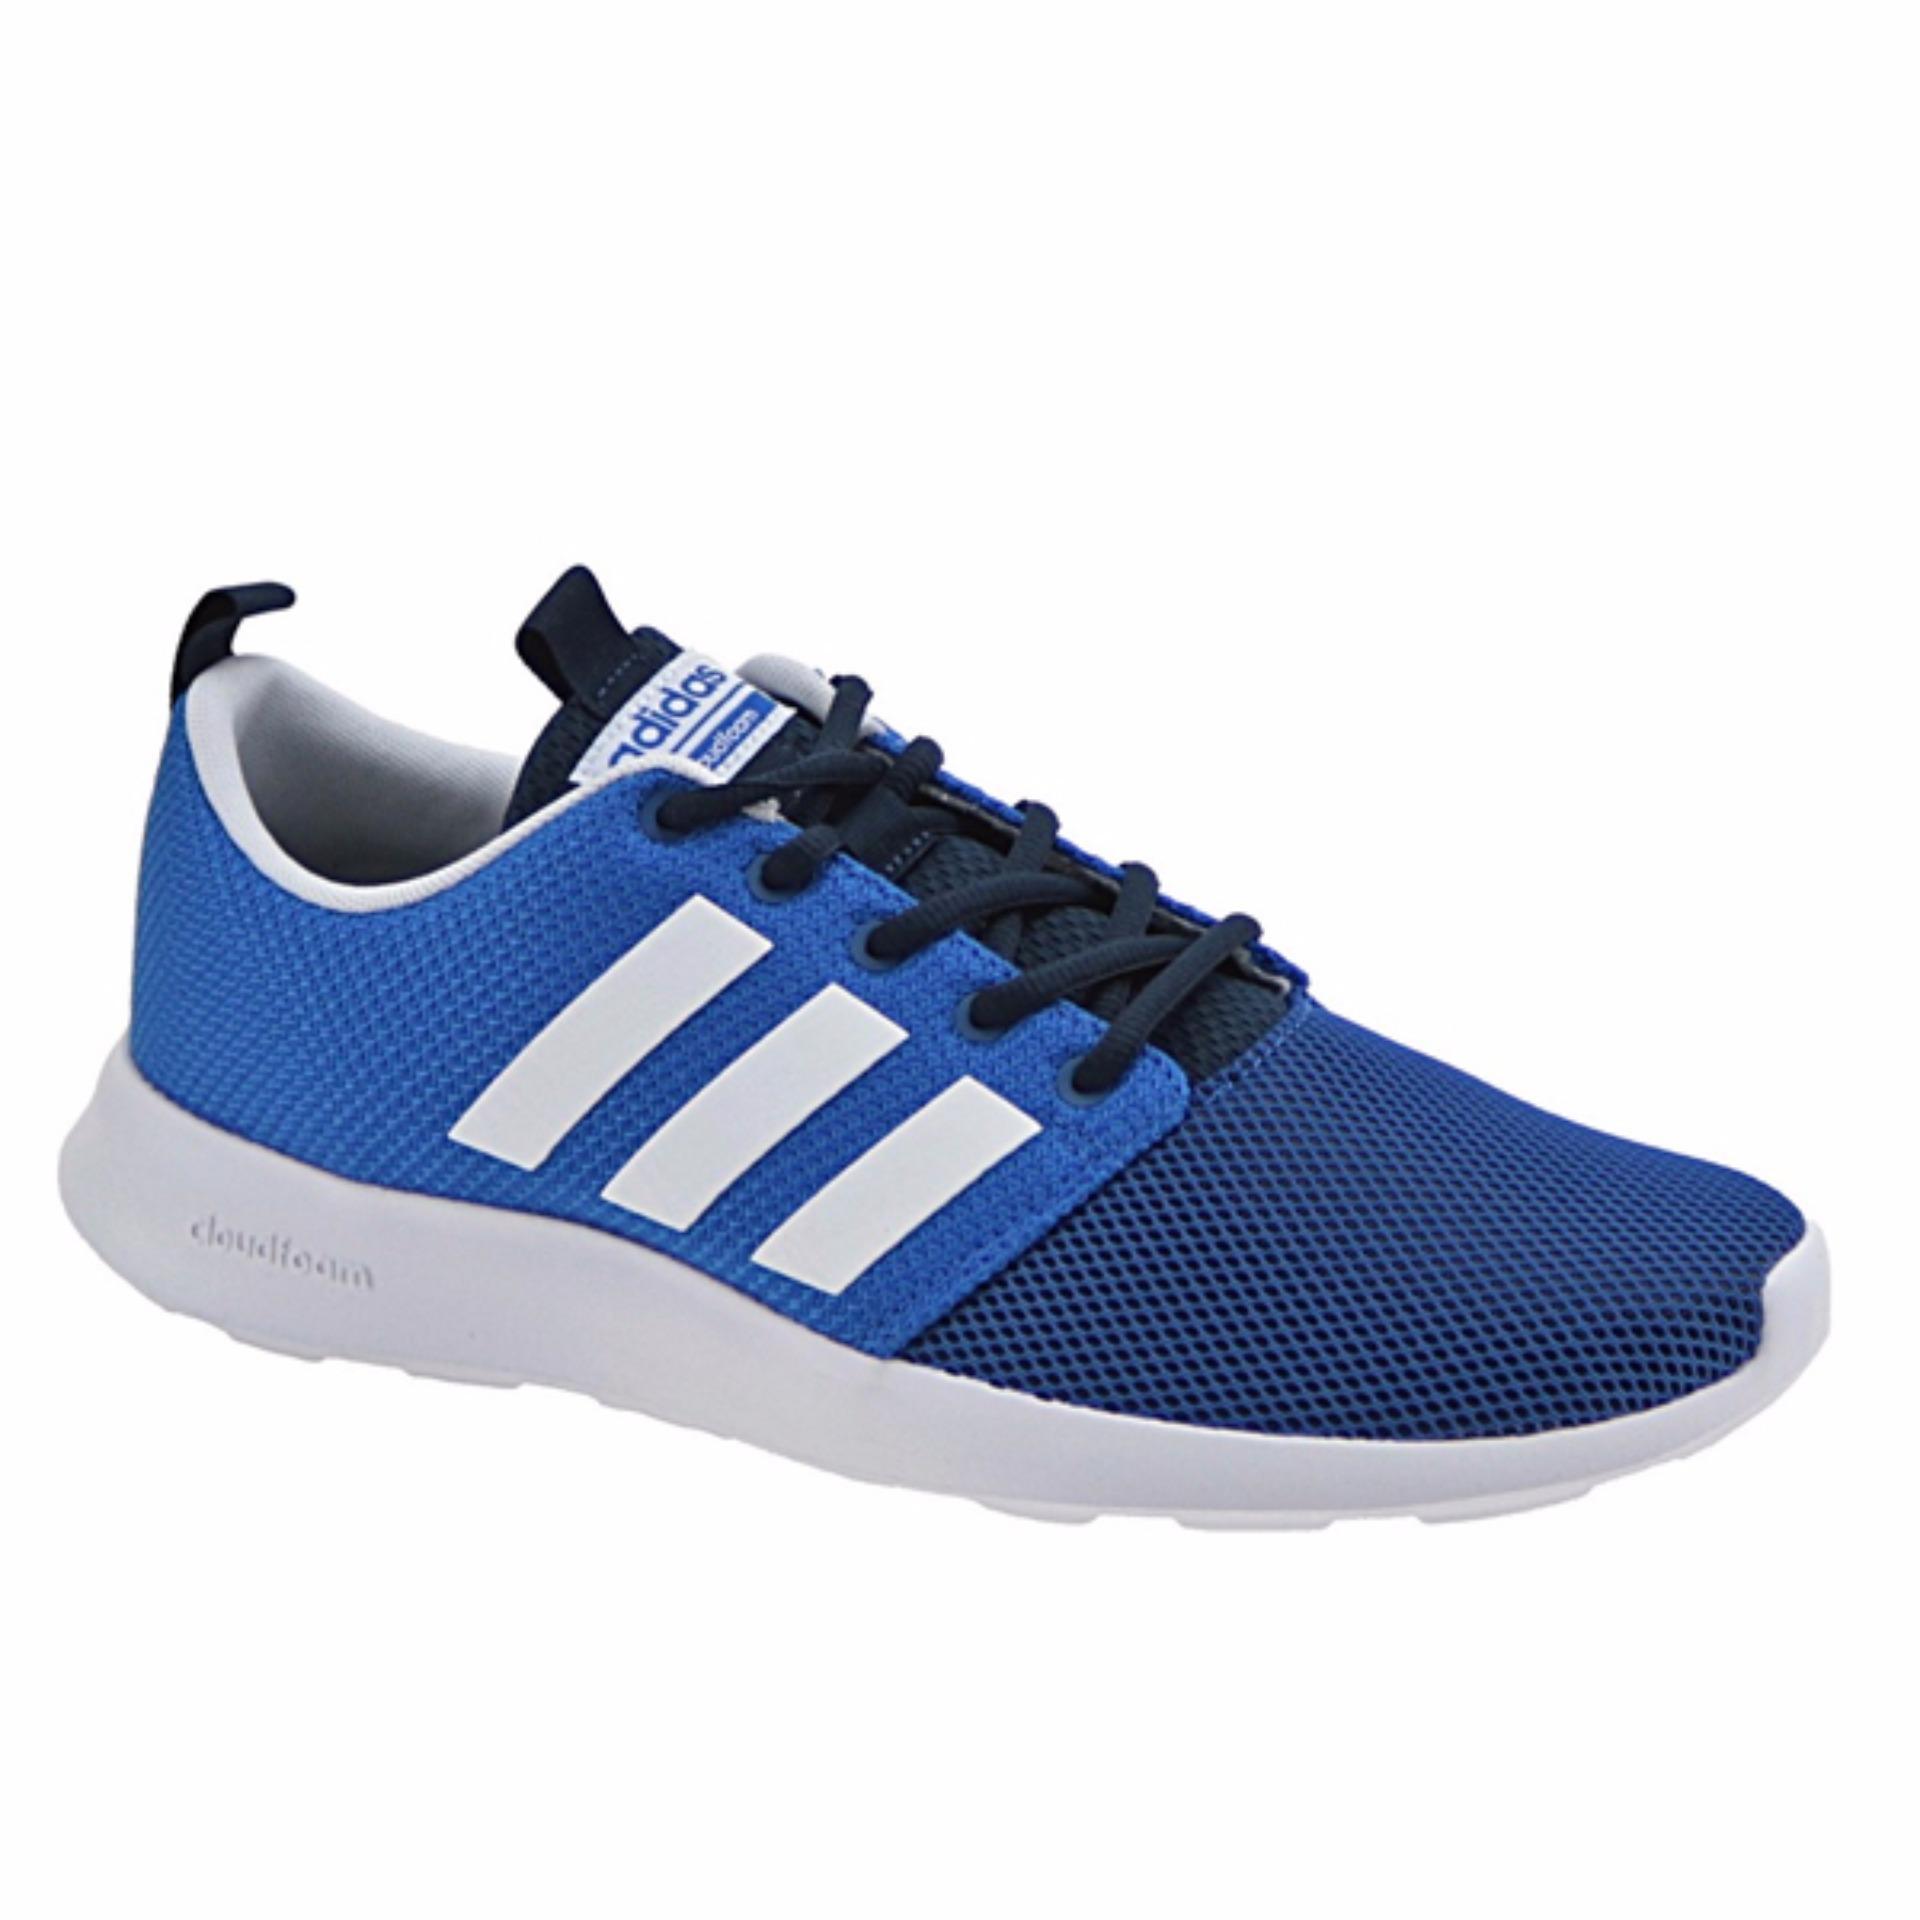 Beli Adidas Sepatu Running Cloudfoam Swift Racer Aw4155 Biru Adidas Online